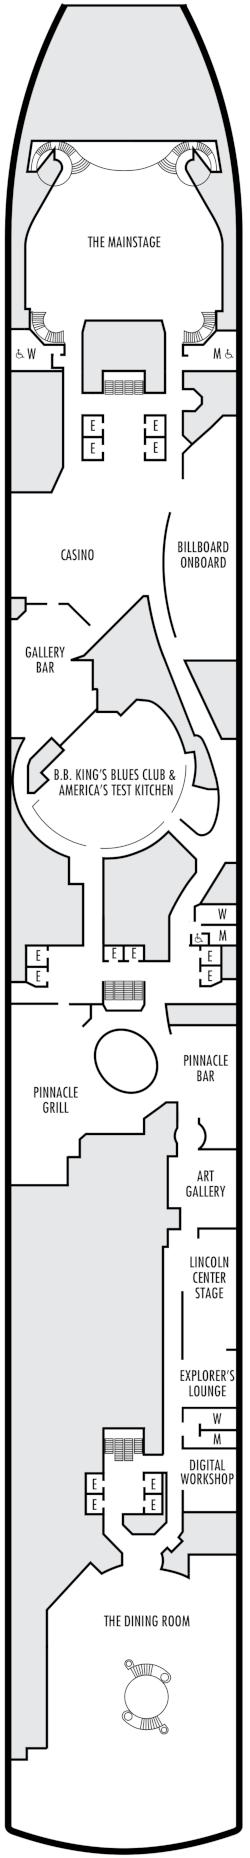 Eurodam Lower Promenade Deck Deck Plan